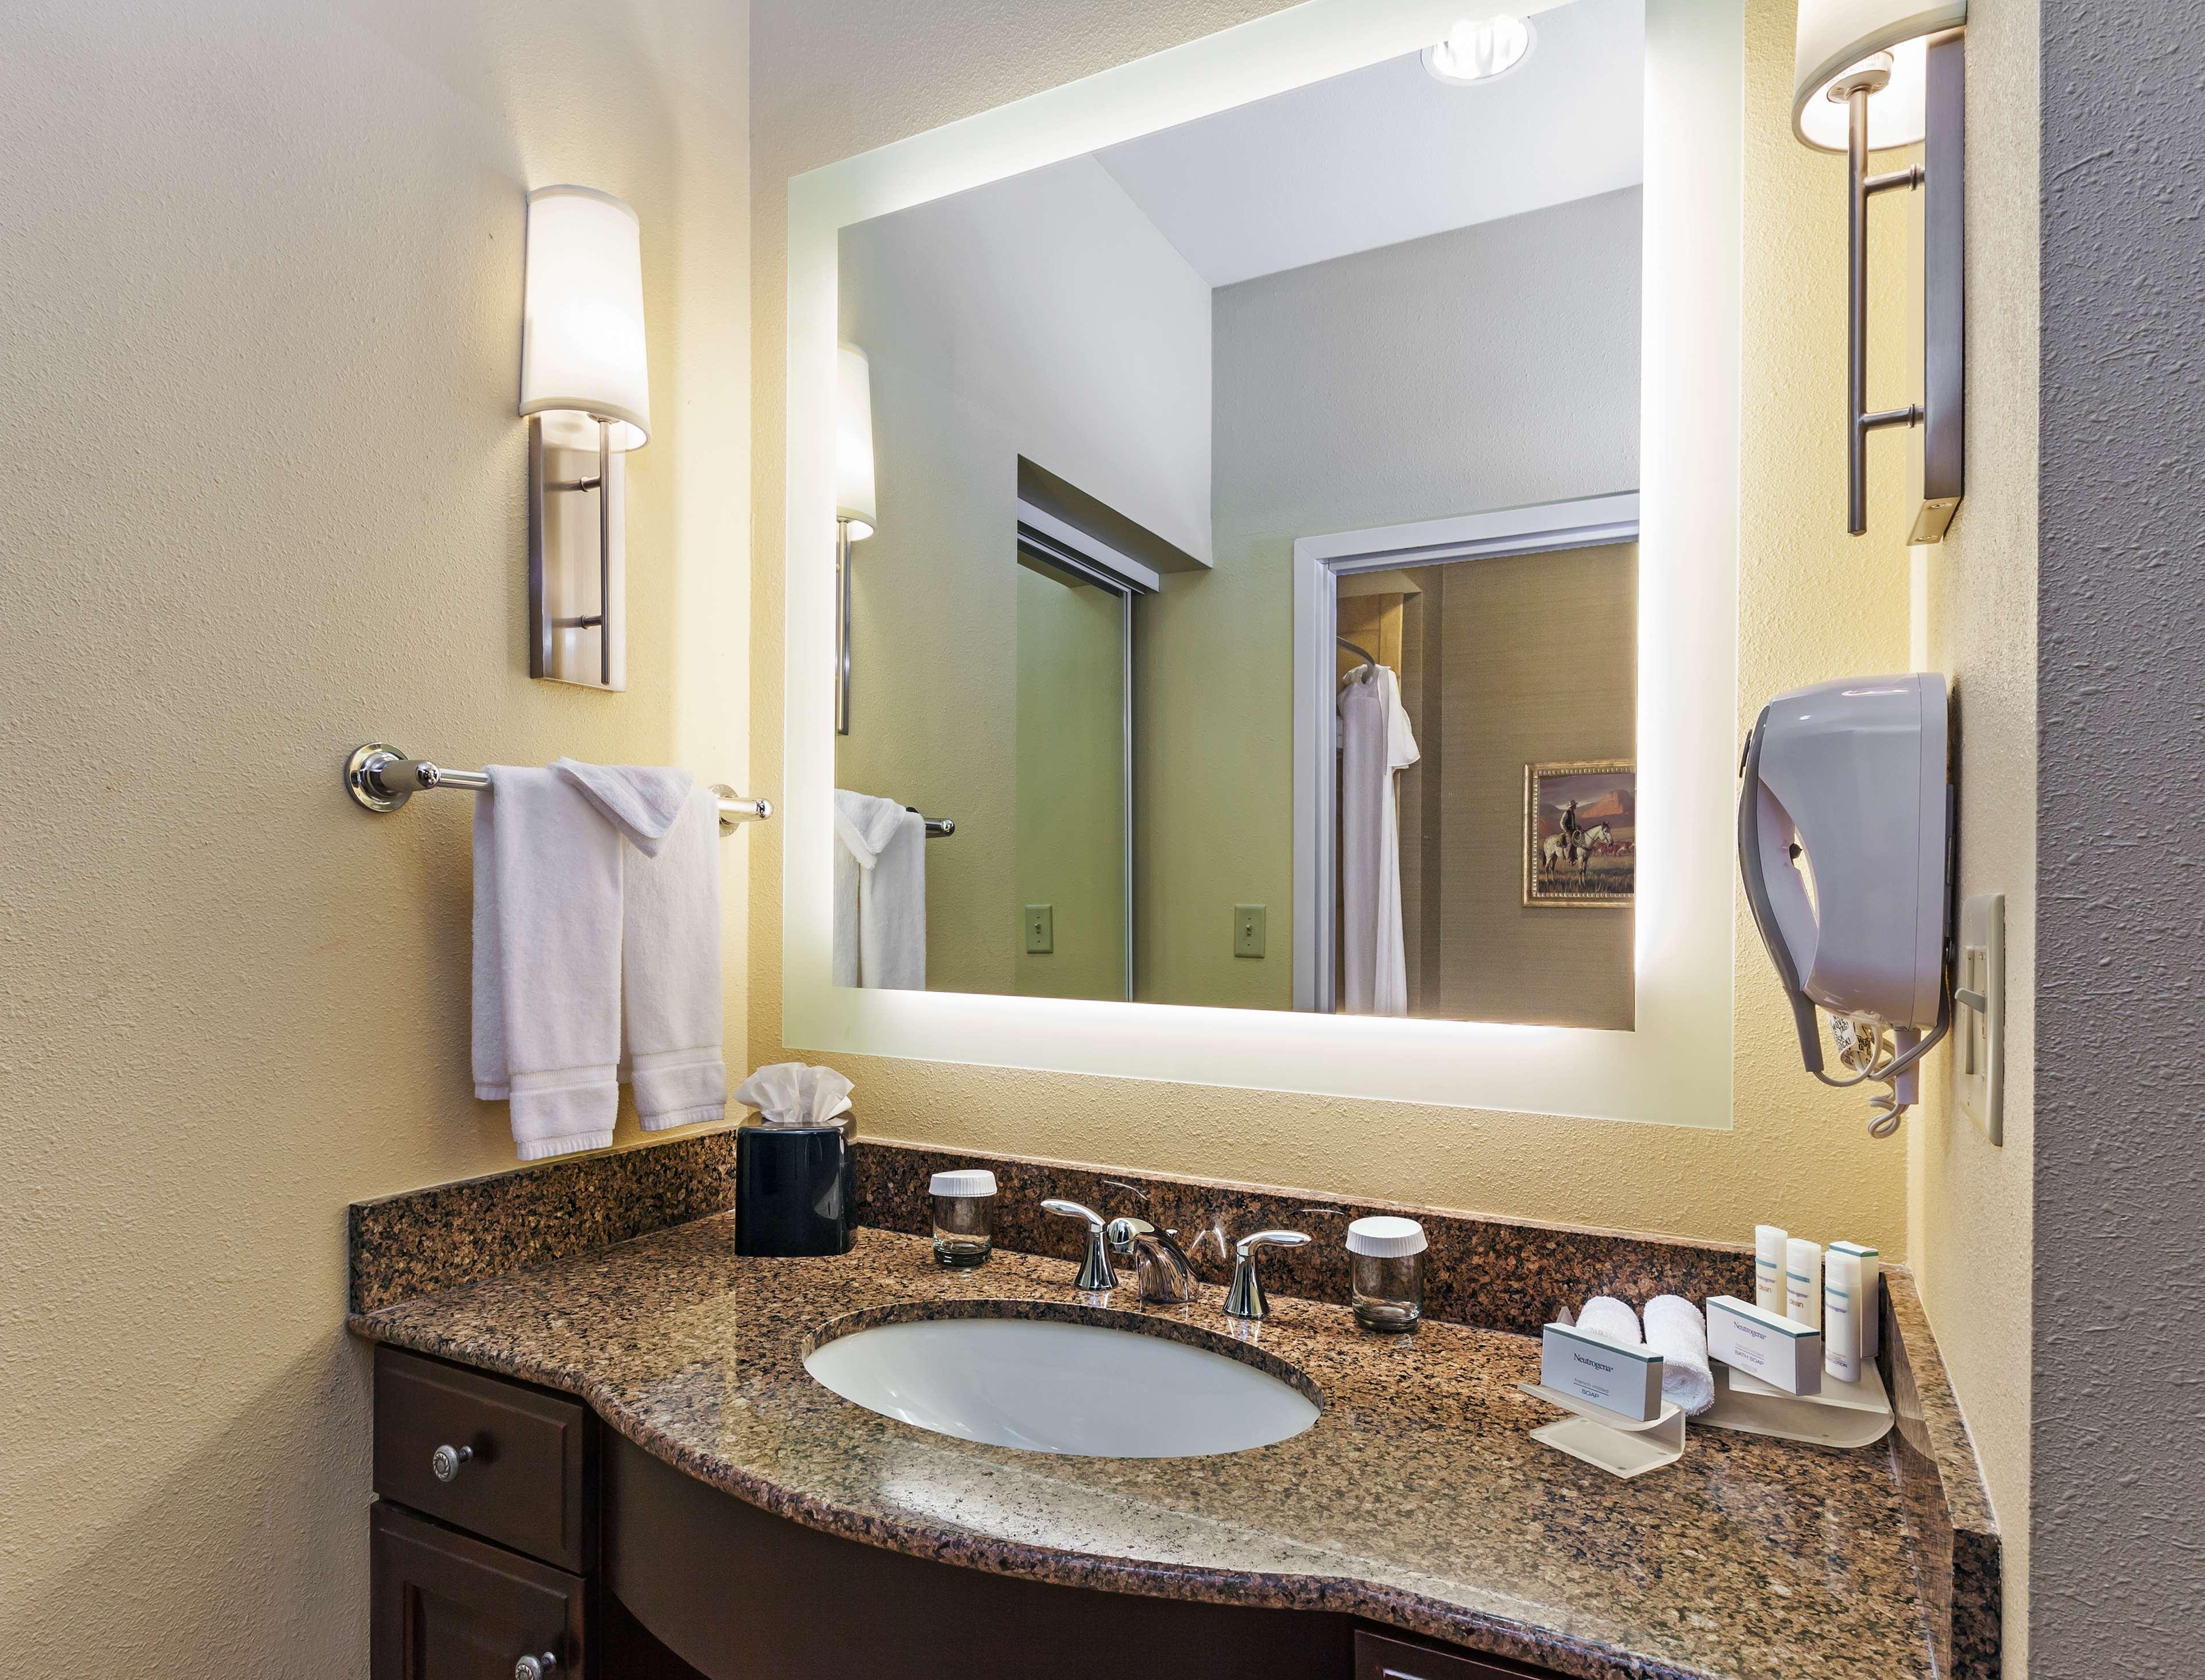 Homewood Suites by Hilton Wichita Falls image 18